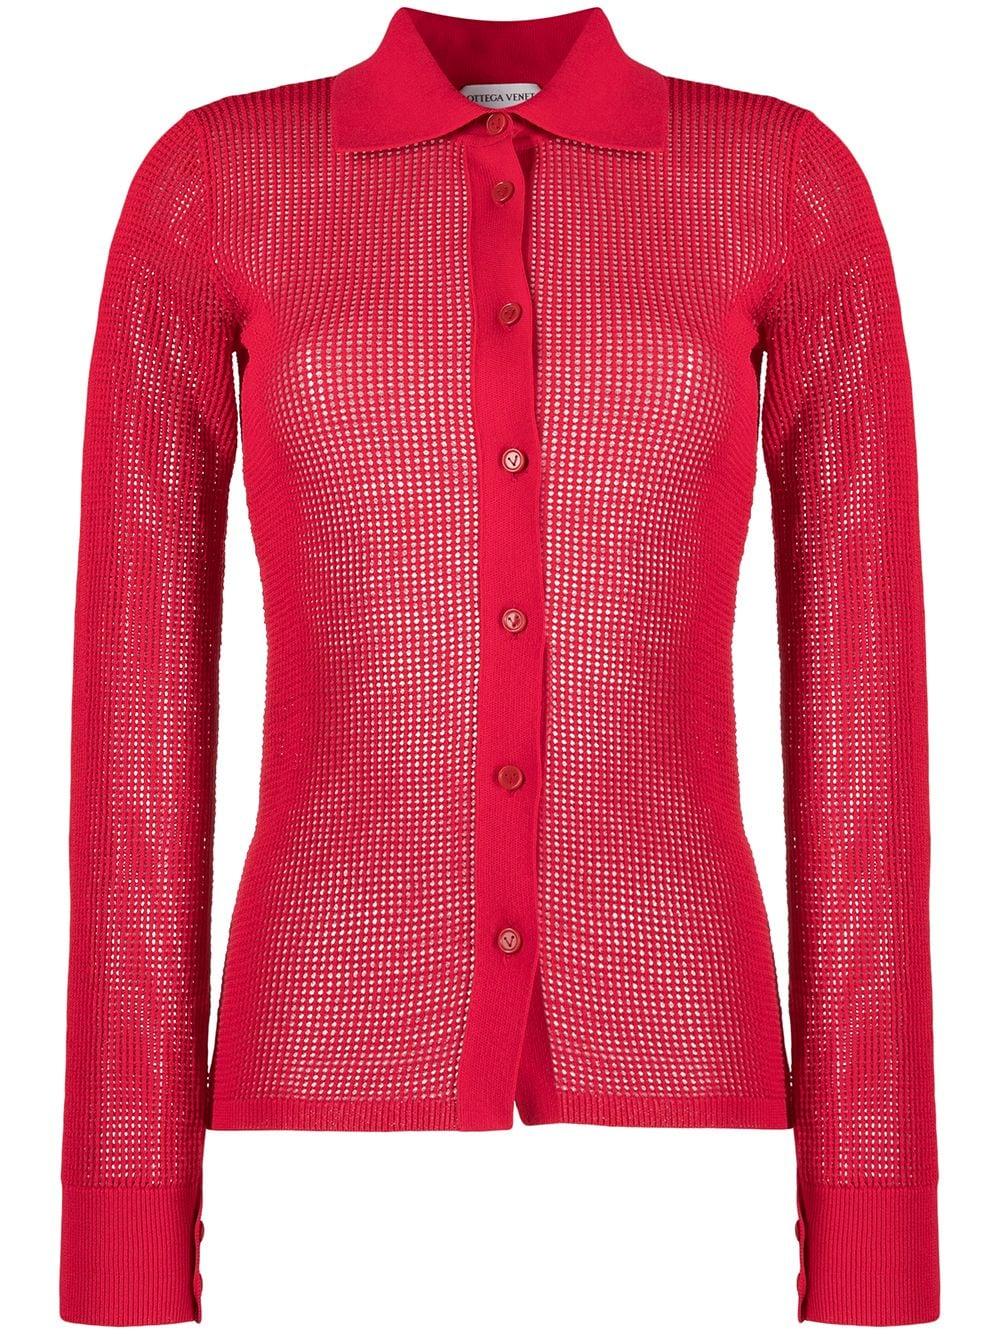 Red cotton sheer shirt featuring classic collar BOTTEGA VENETA      648977-V0BN06144